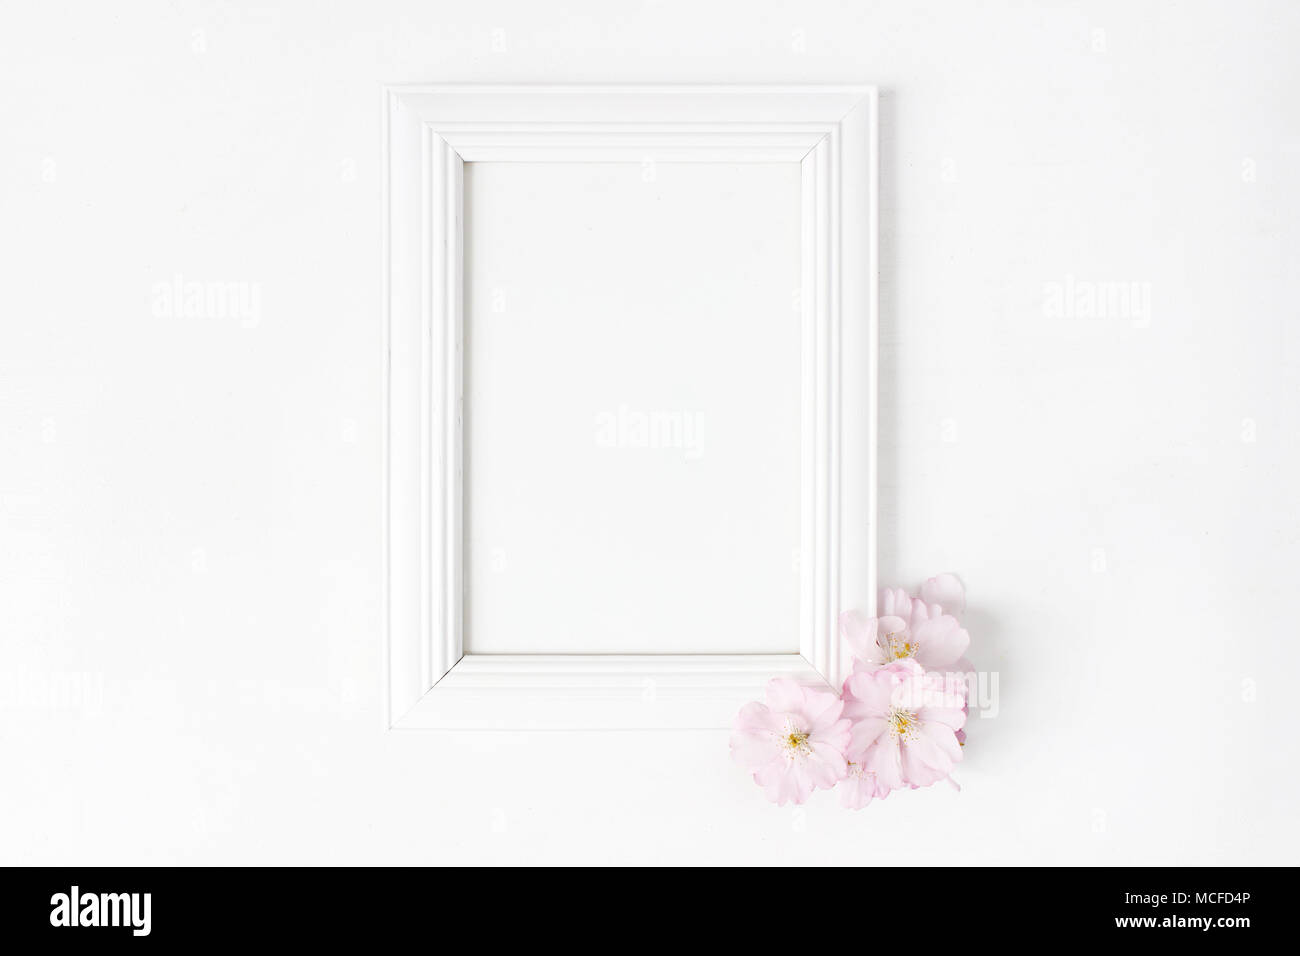 Flowers Photo Frame Room Stockfotos & Flowers Photo Frame Room ...